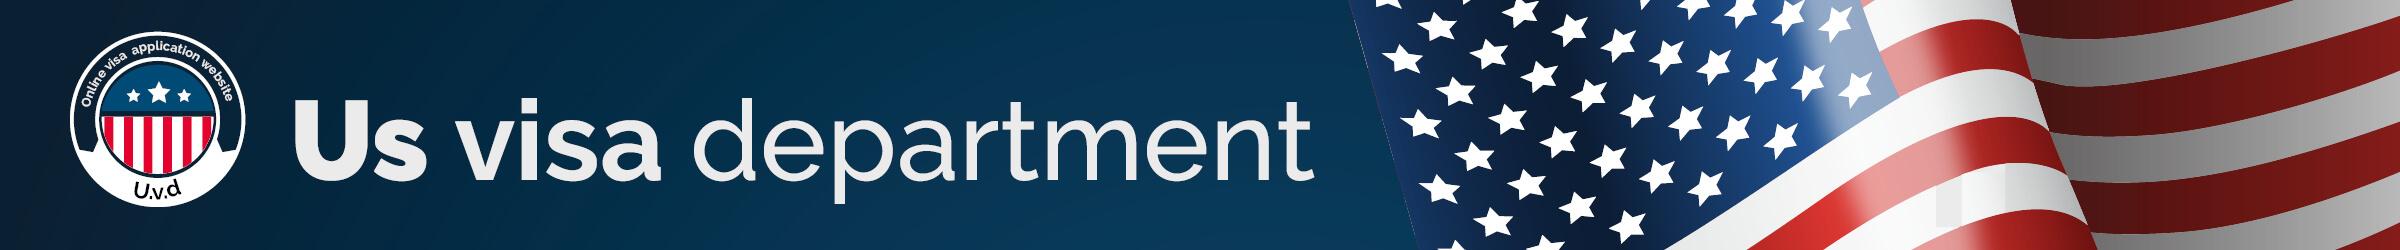 "US VISA DEPARTMENT - שירות אונליין להוצאת ויזות לארה""ב"